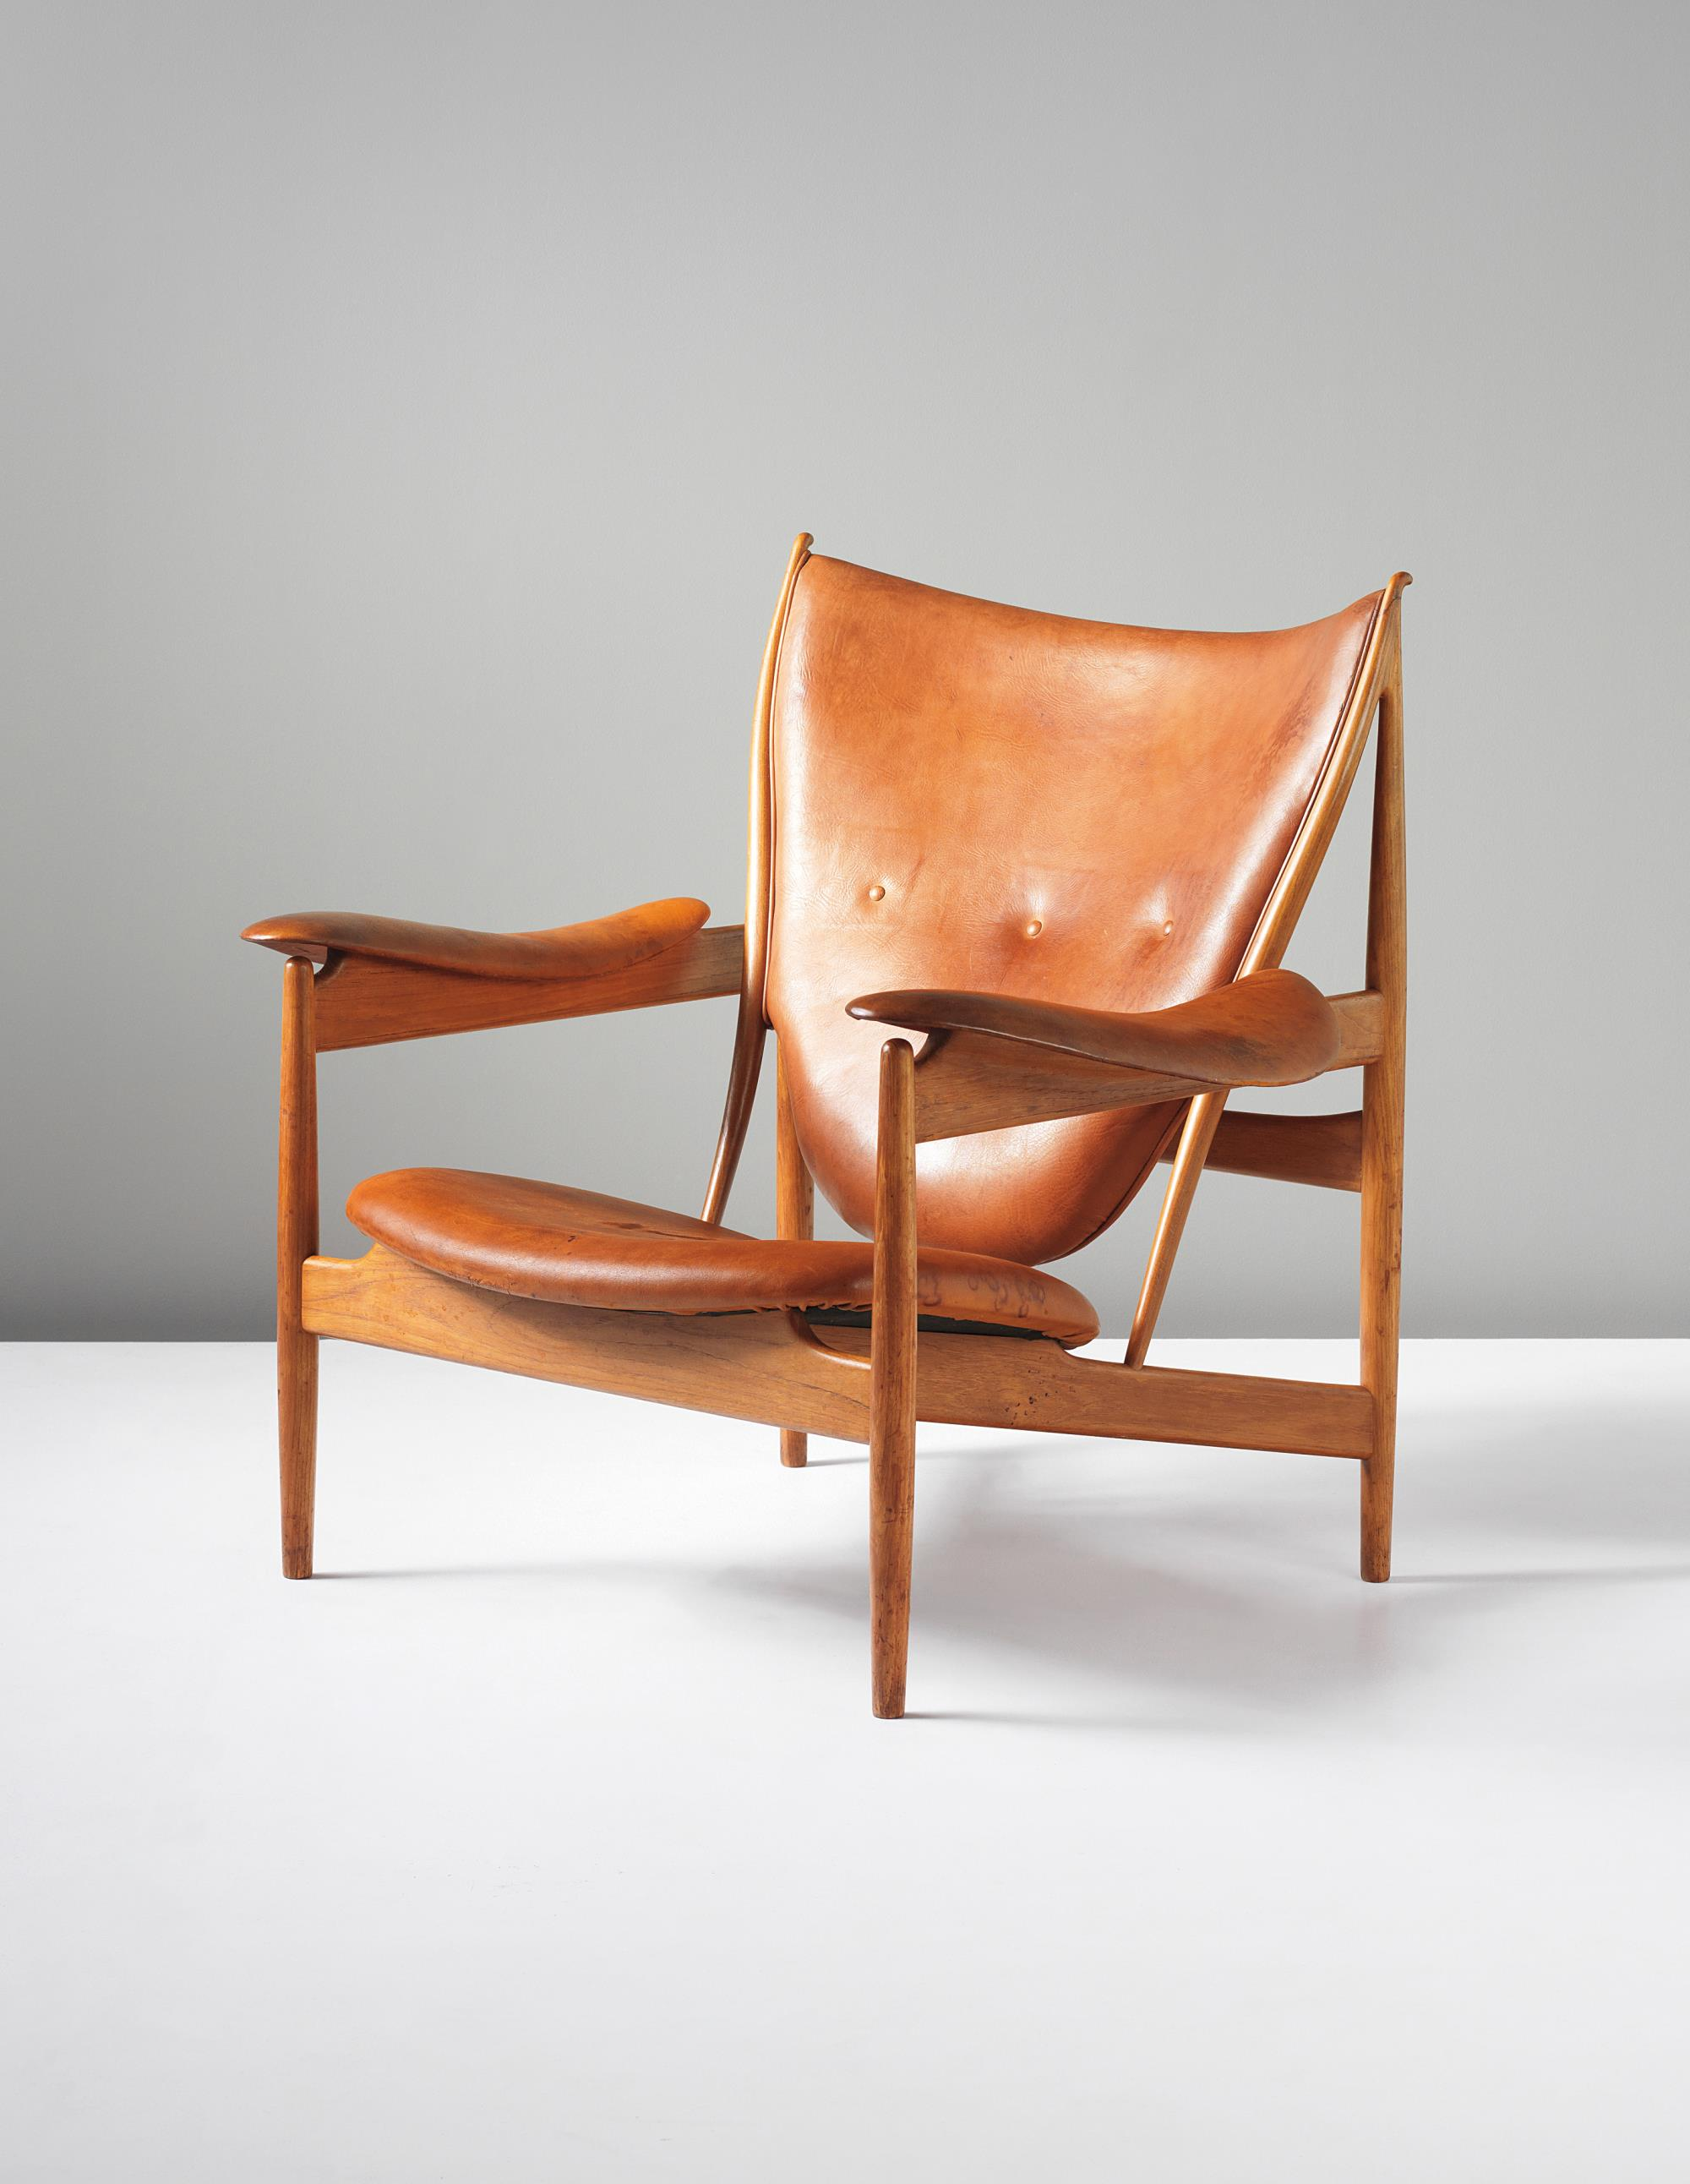 5 Most Expensive Scandinavian Design Furniture